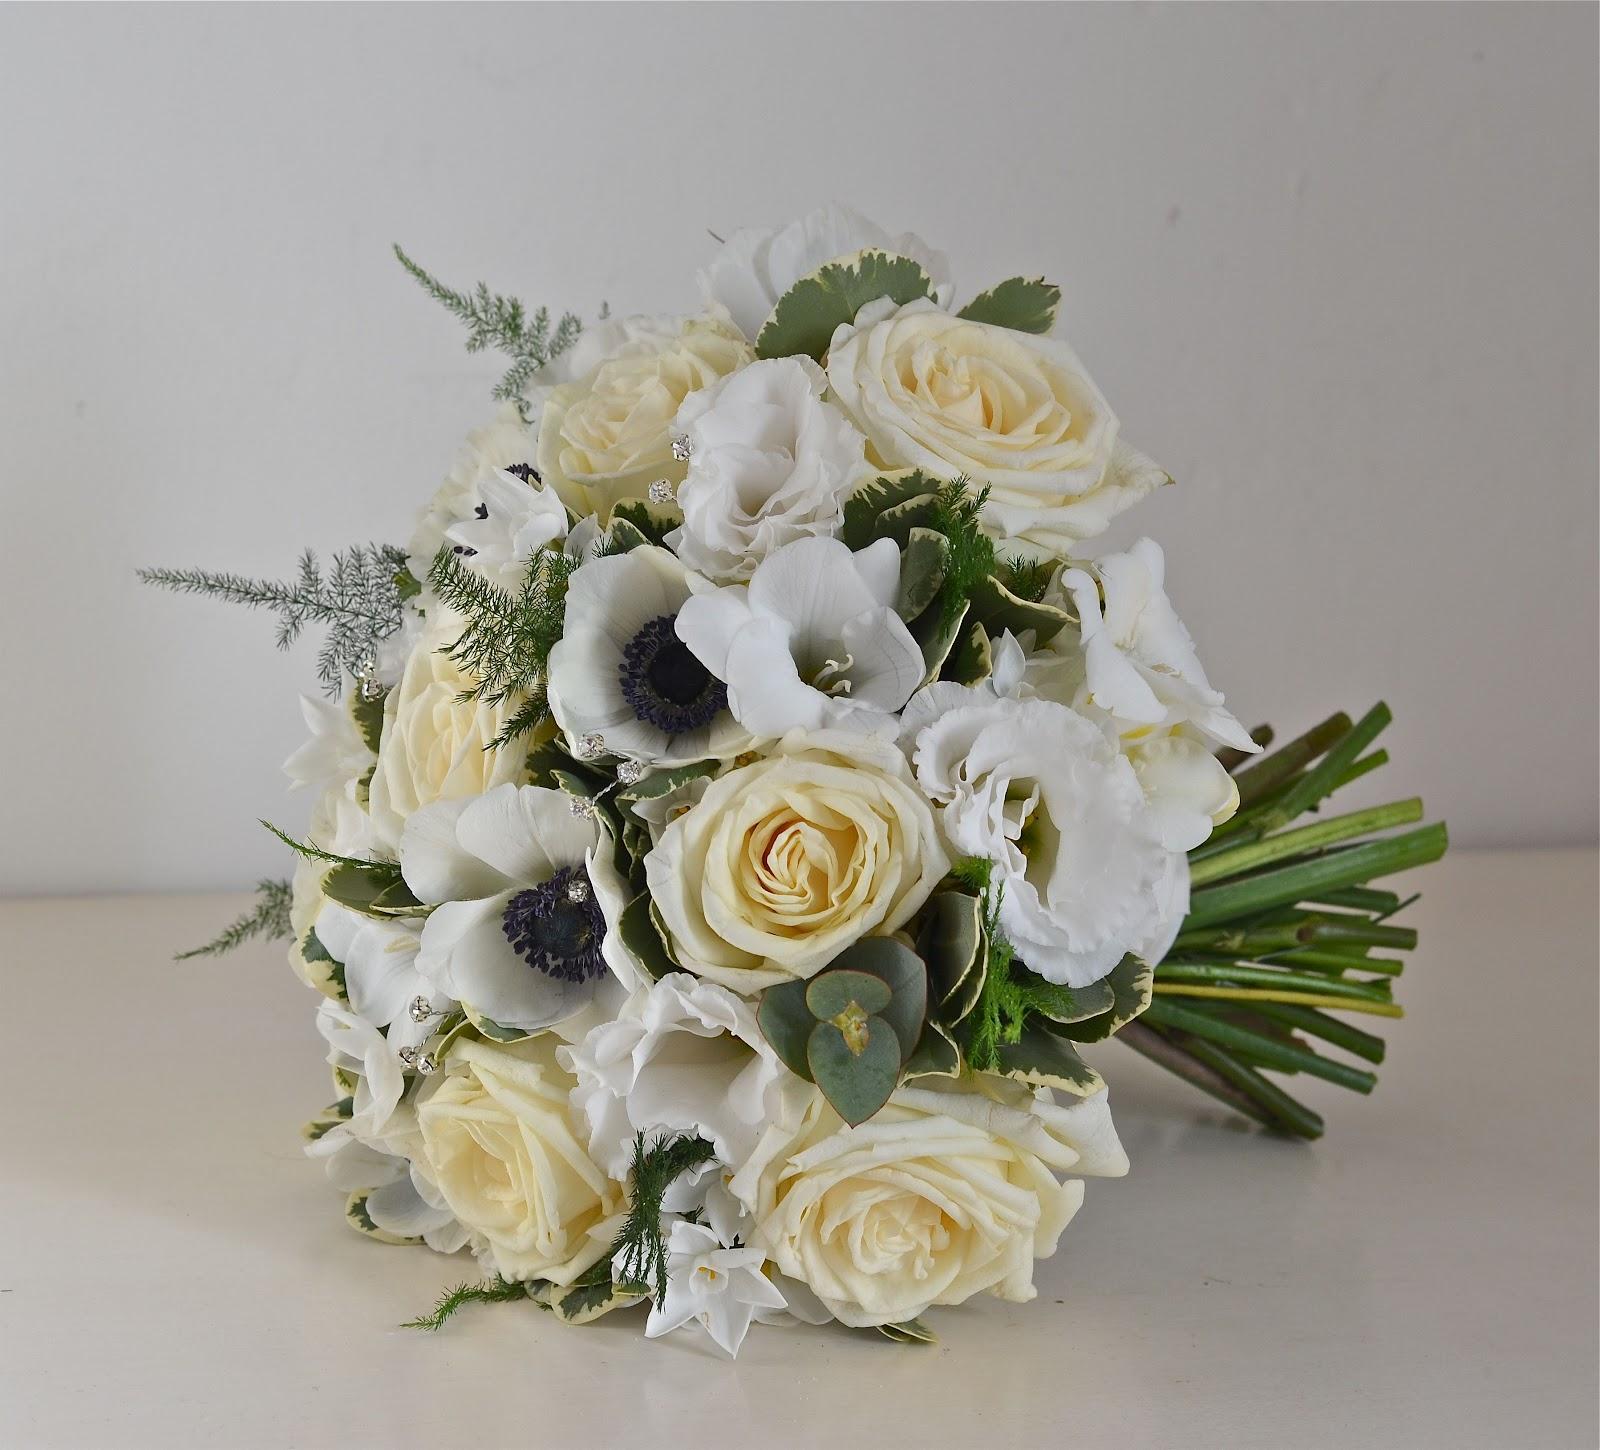 Wedding Flowers Blog February 2012